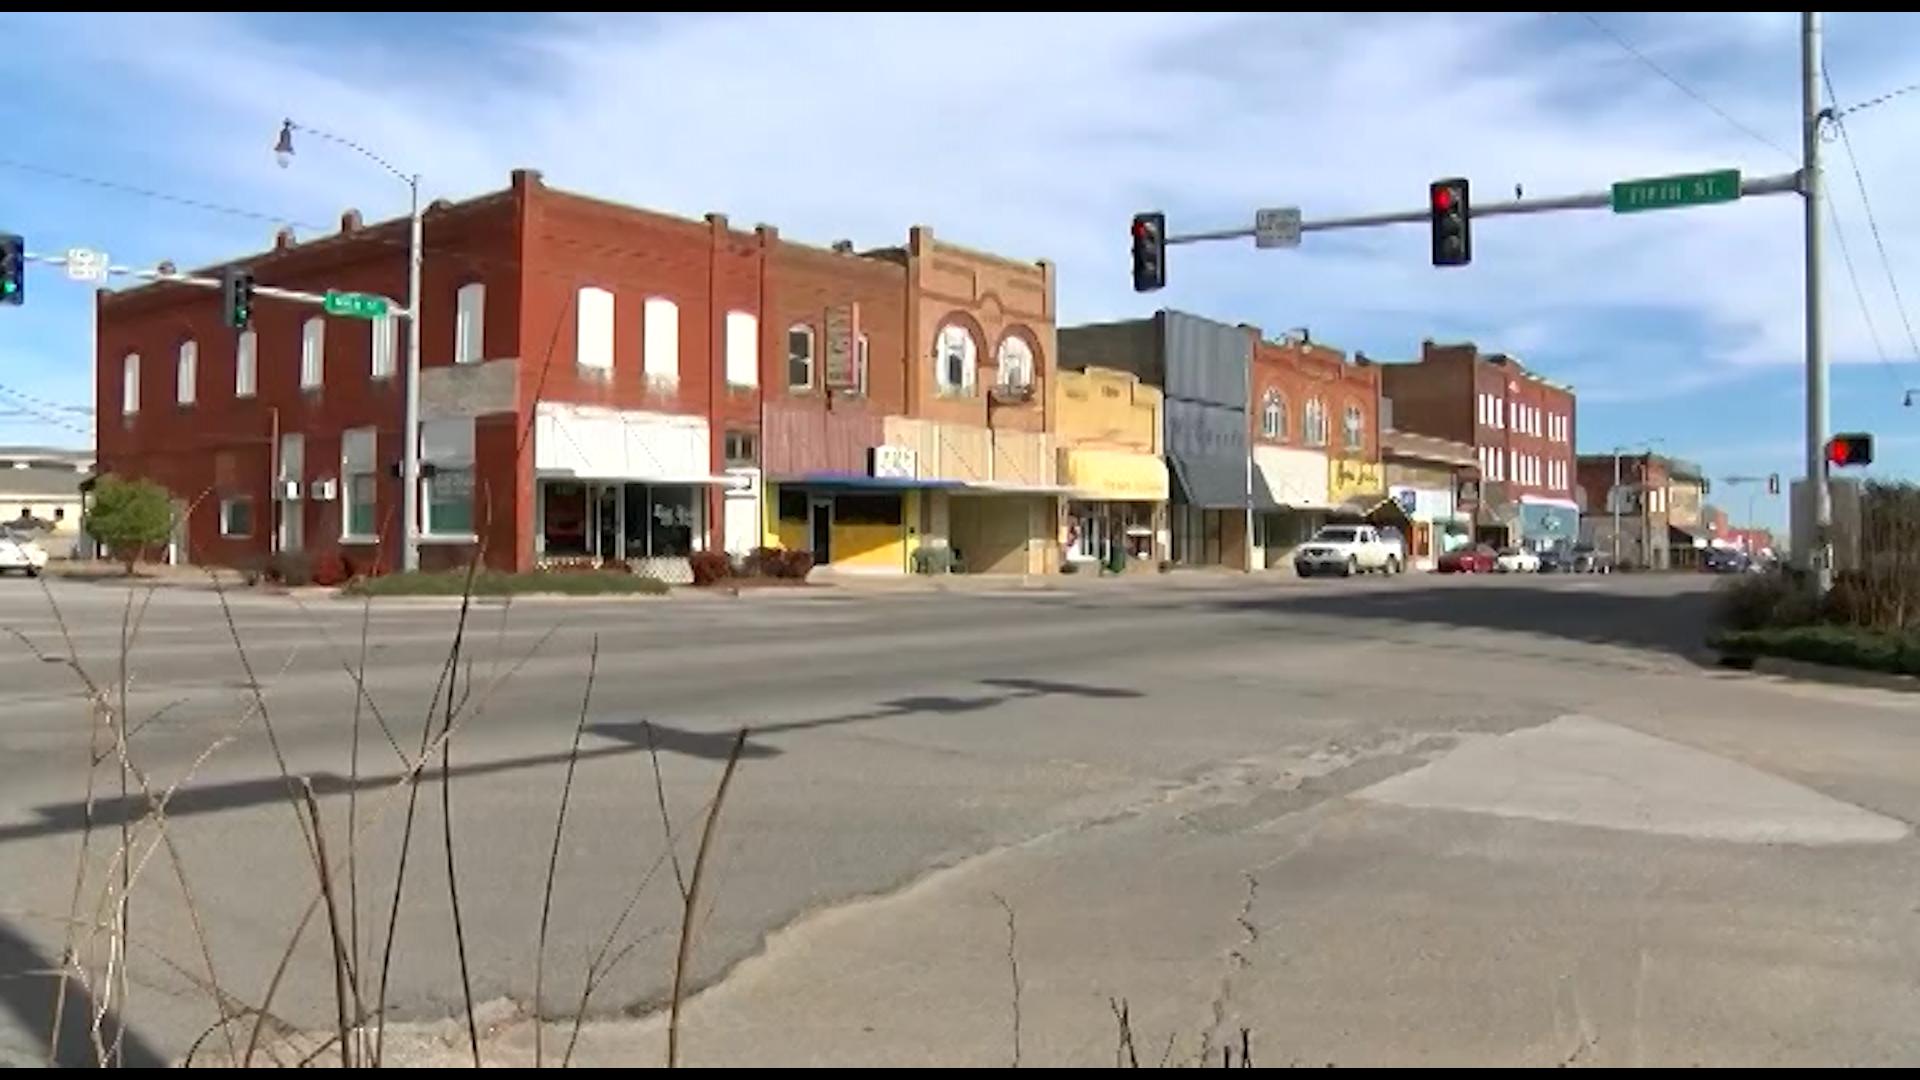 Downtown Henryetta, Oklahoma